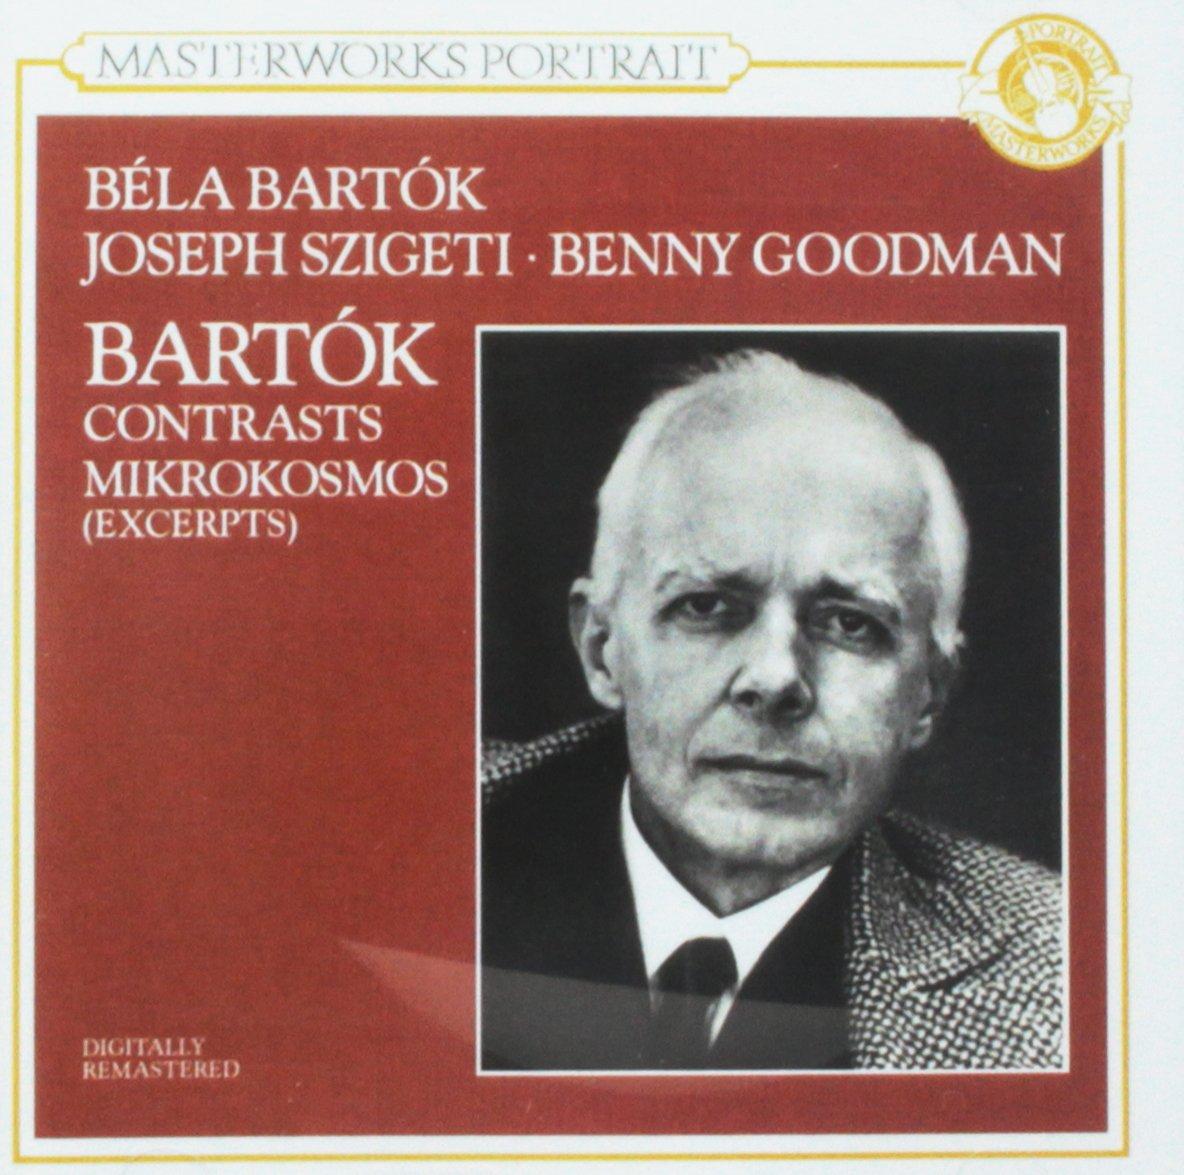 Contrasts Mikrokosmos by CBS Records